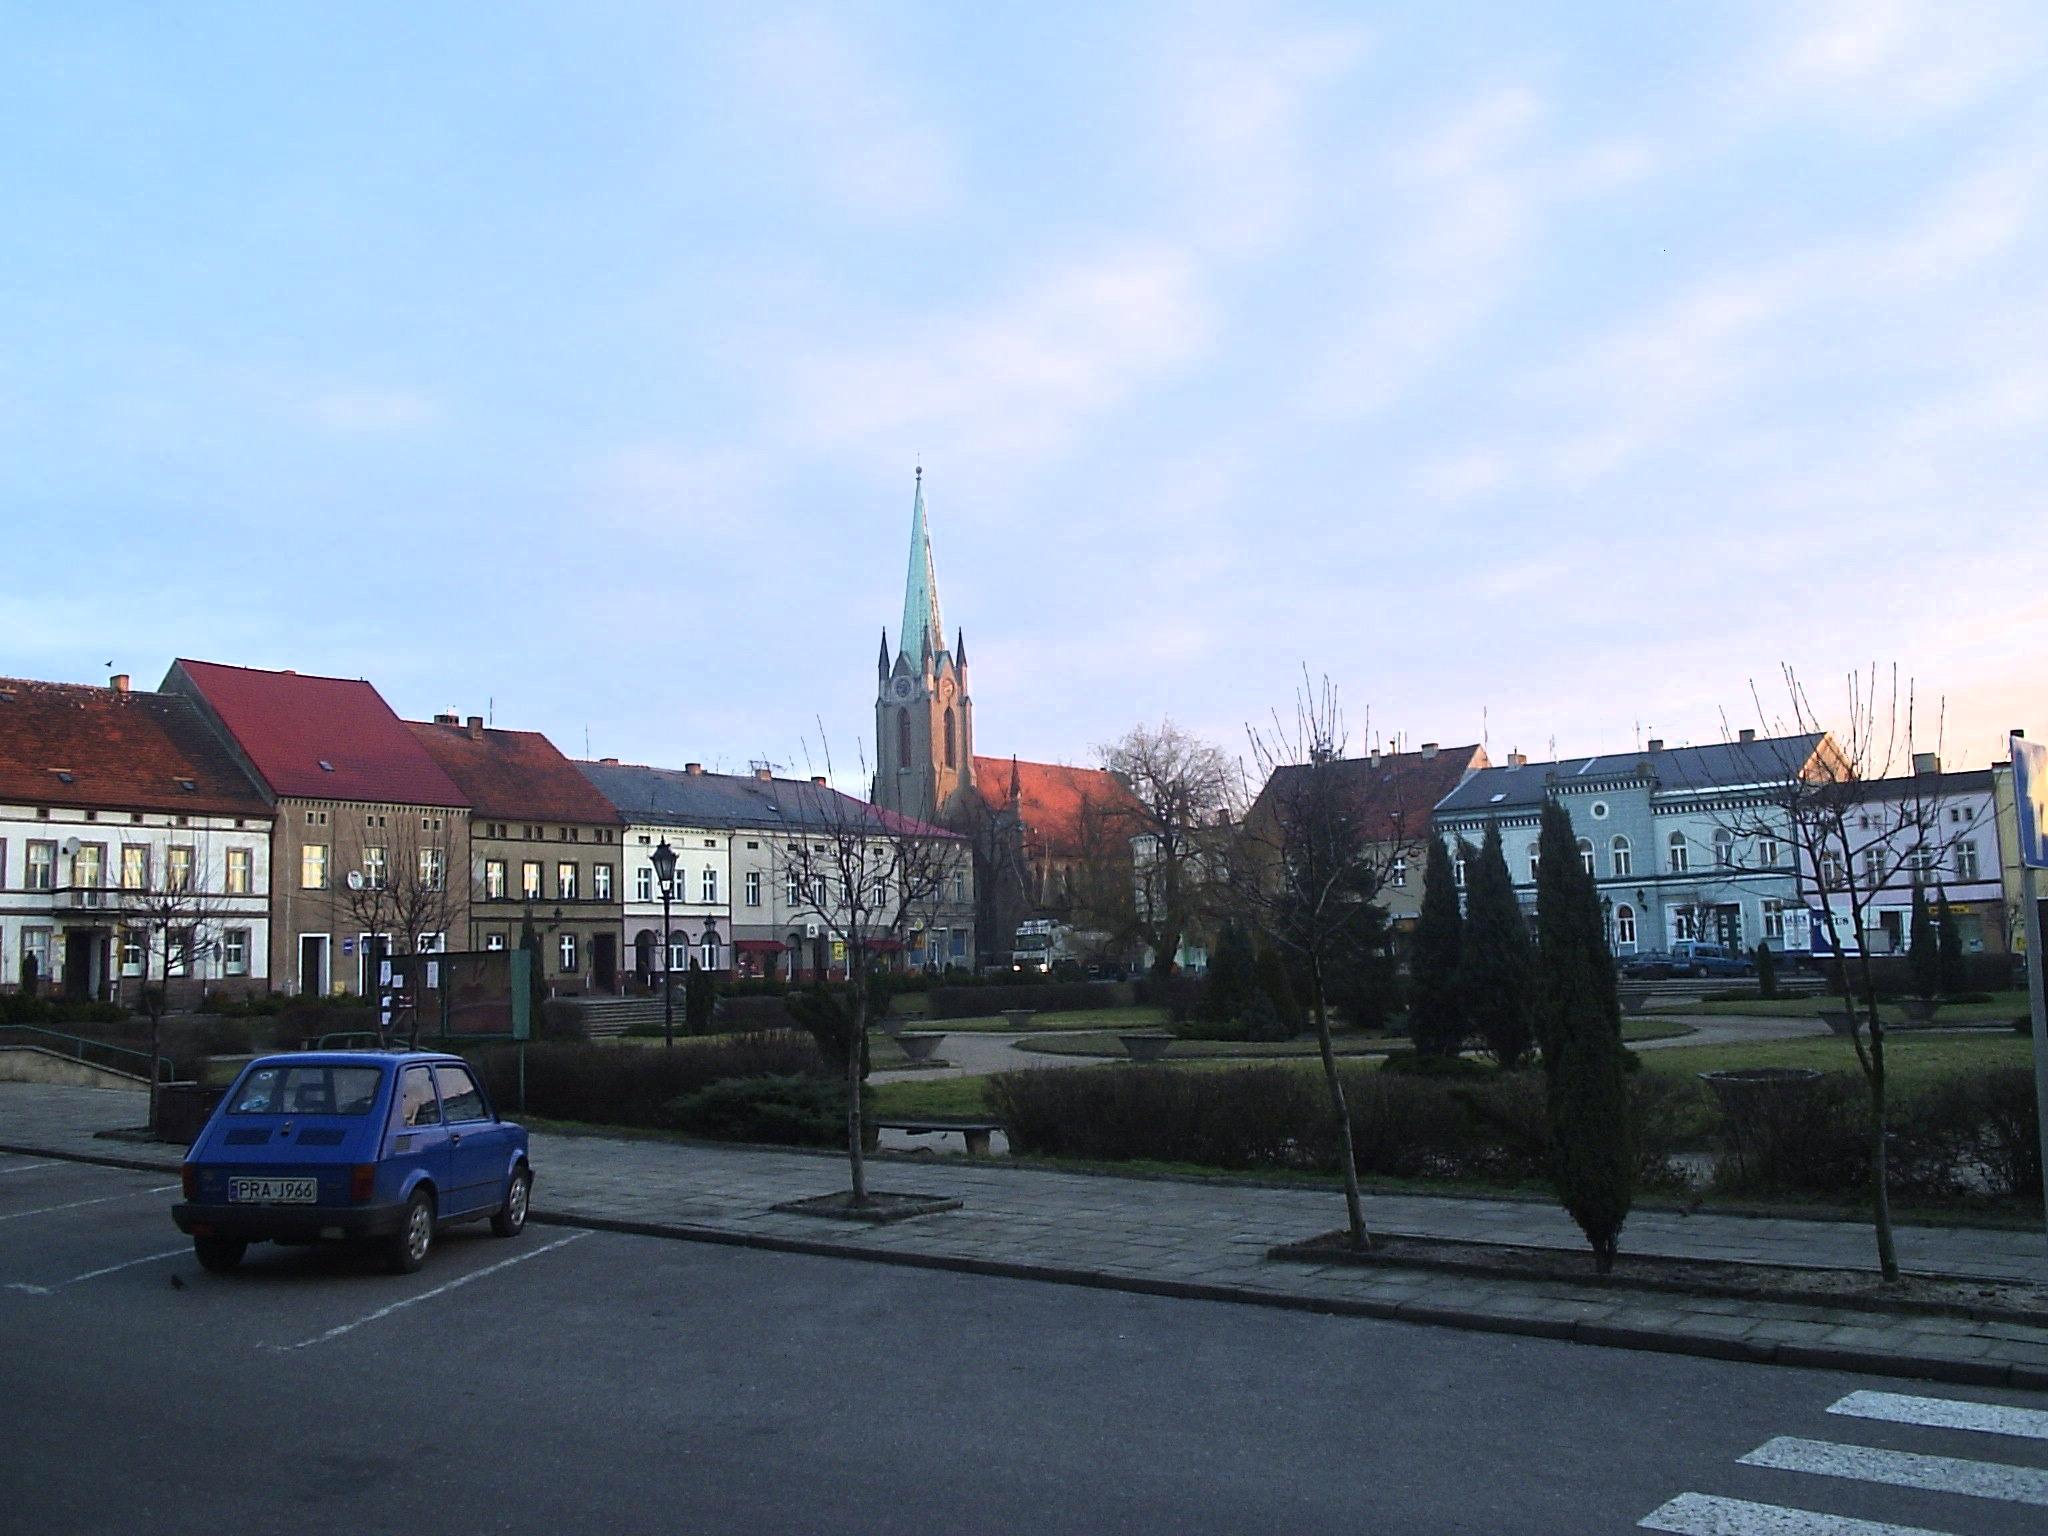 Bojanowo (plaats)